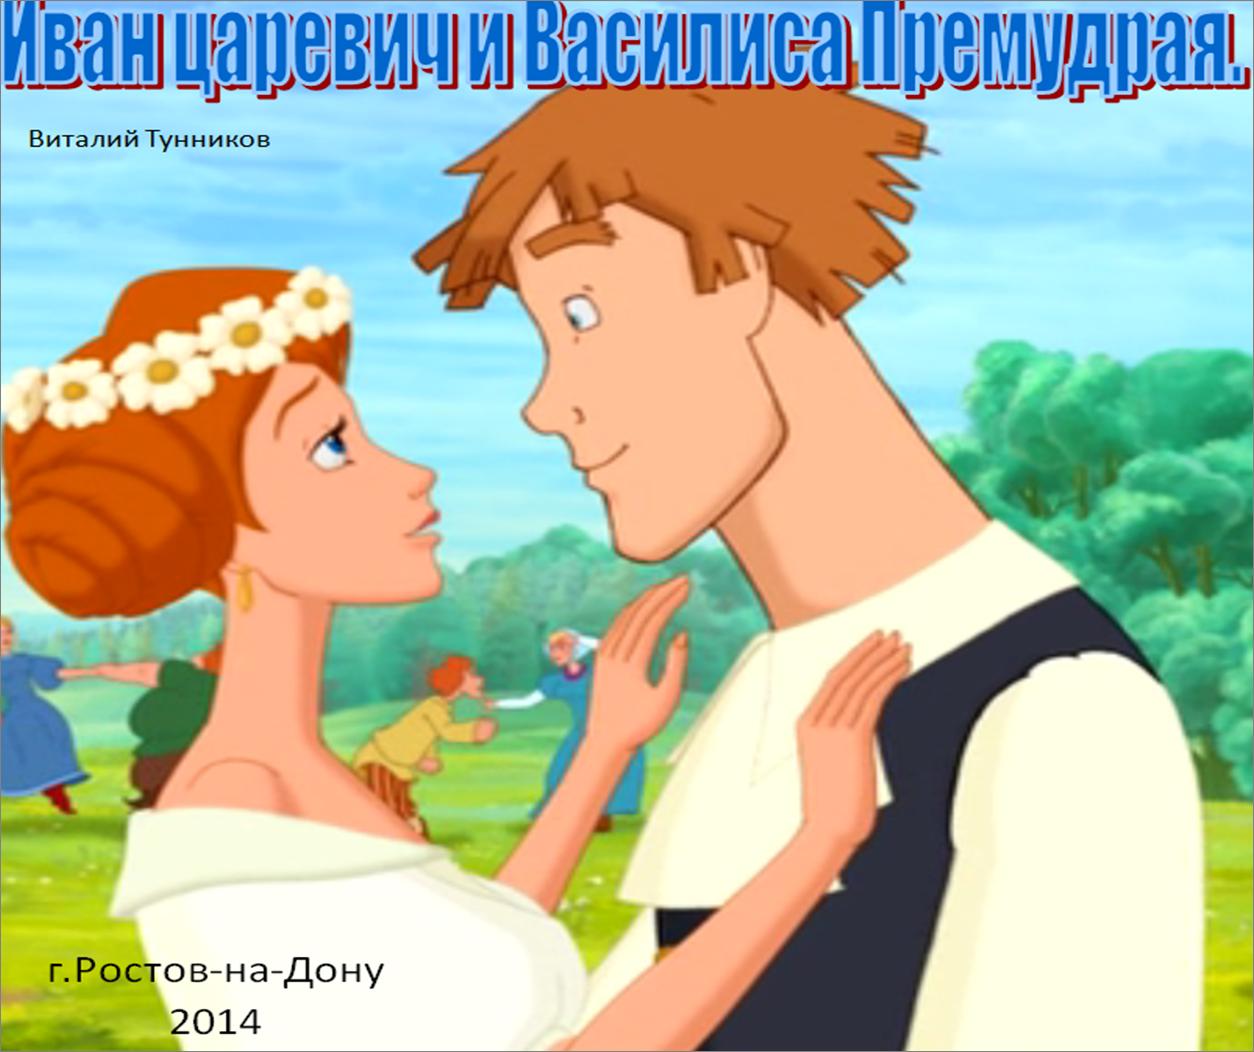 Царевич порнофильм иван